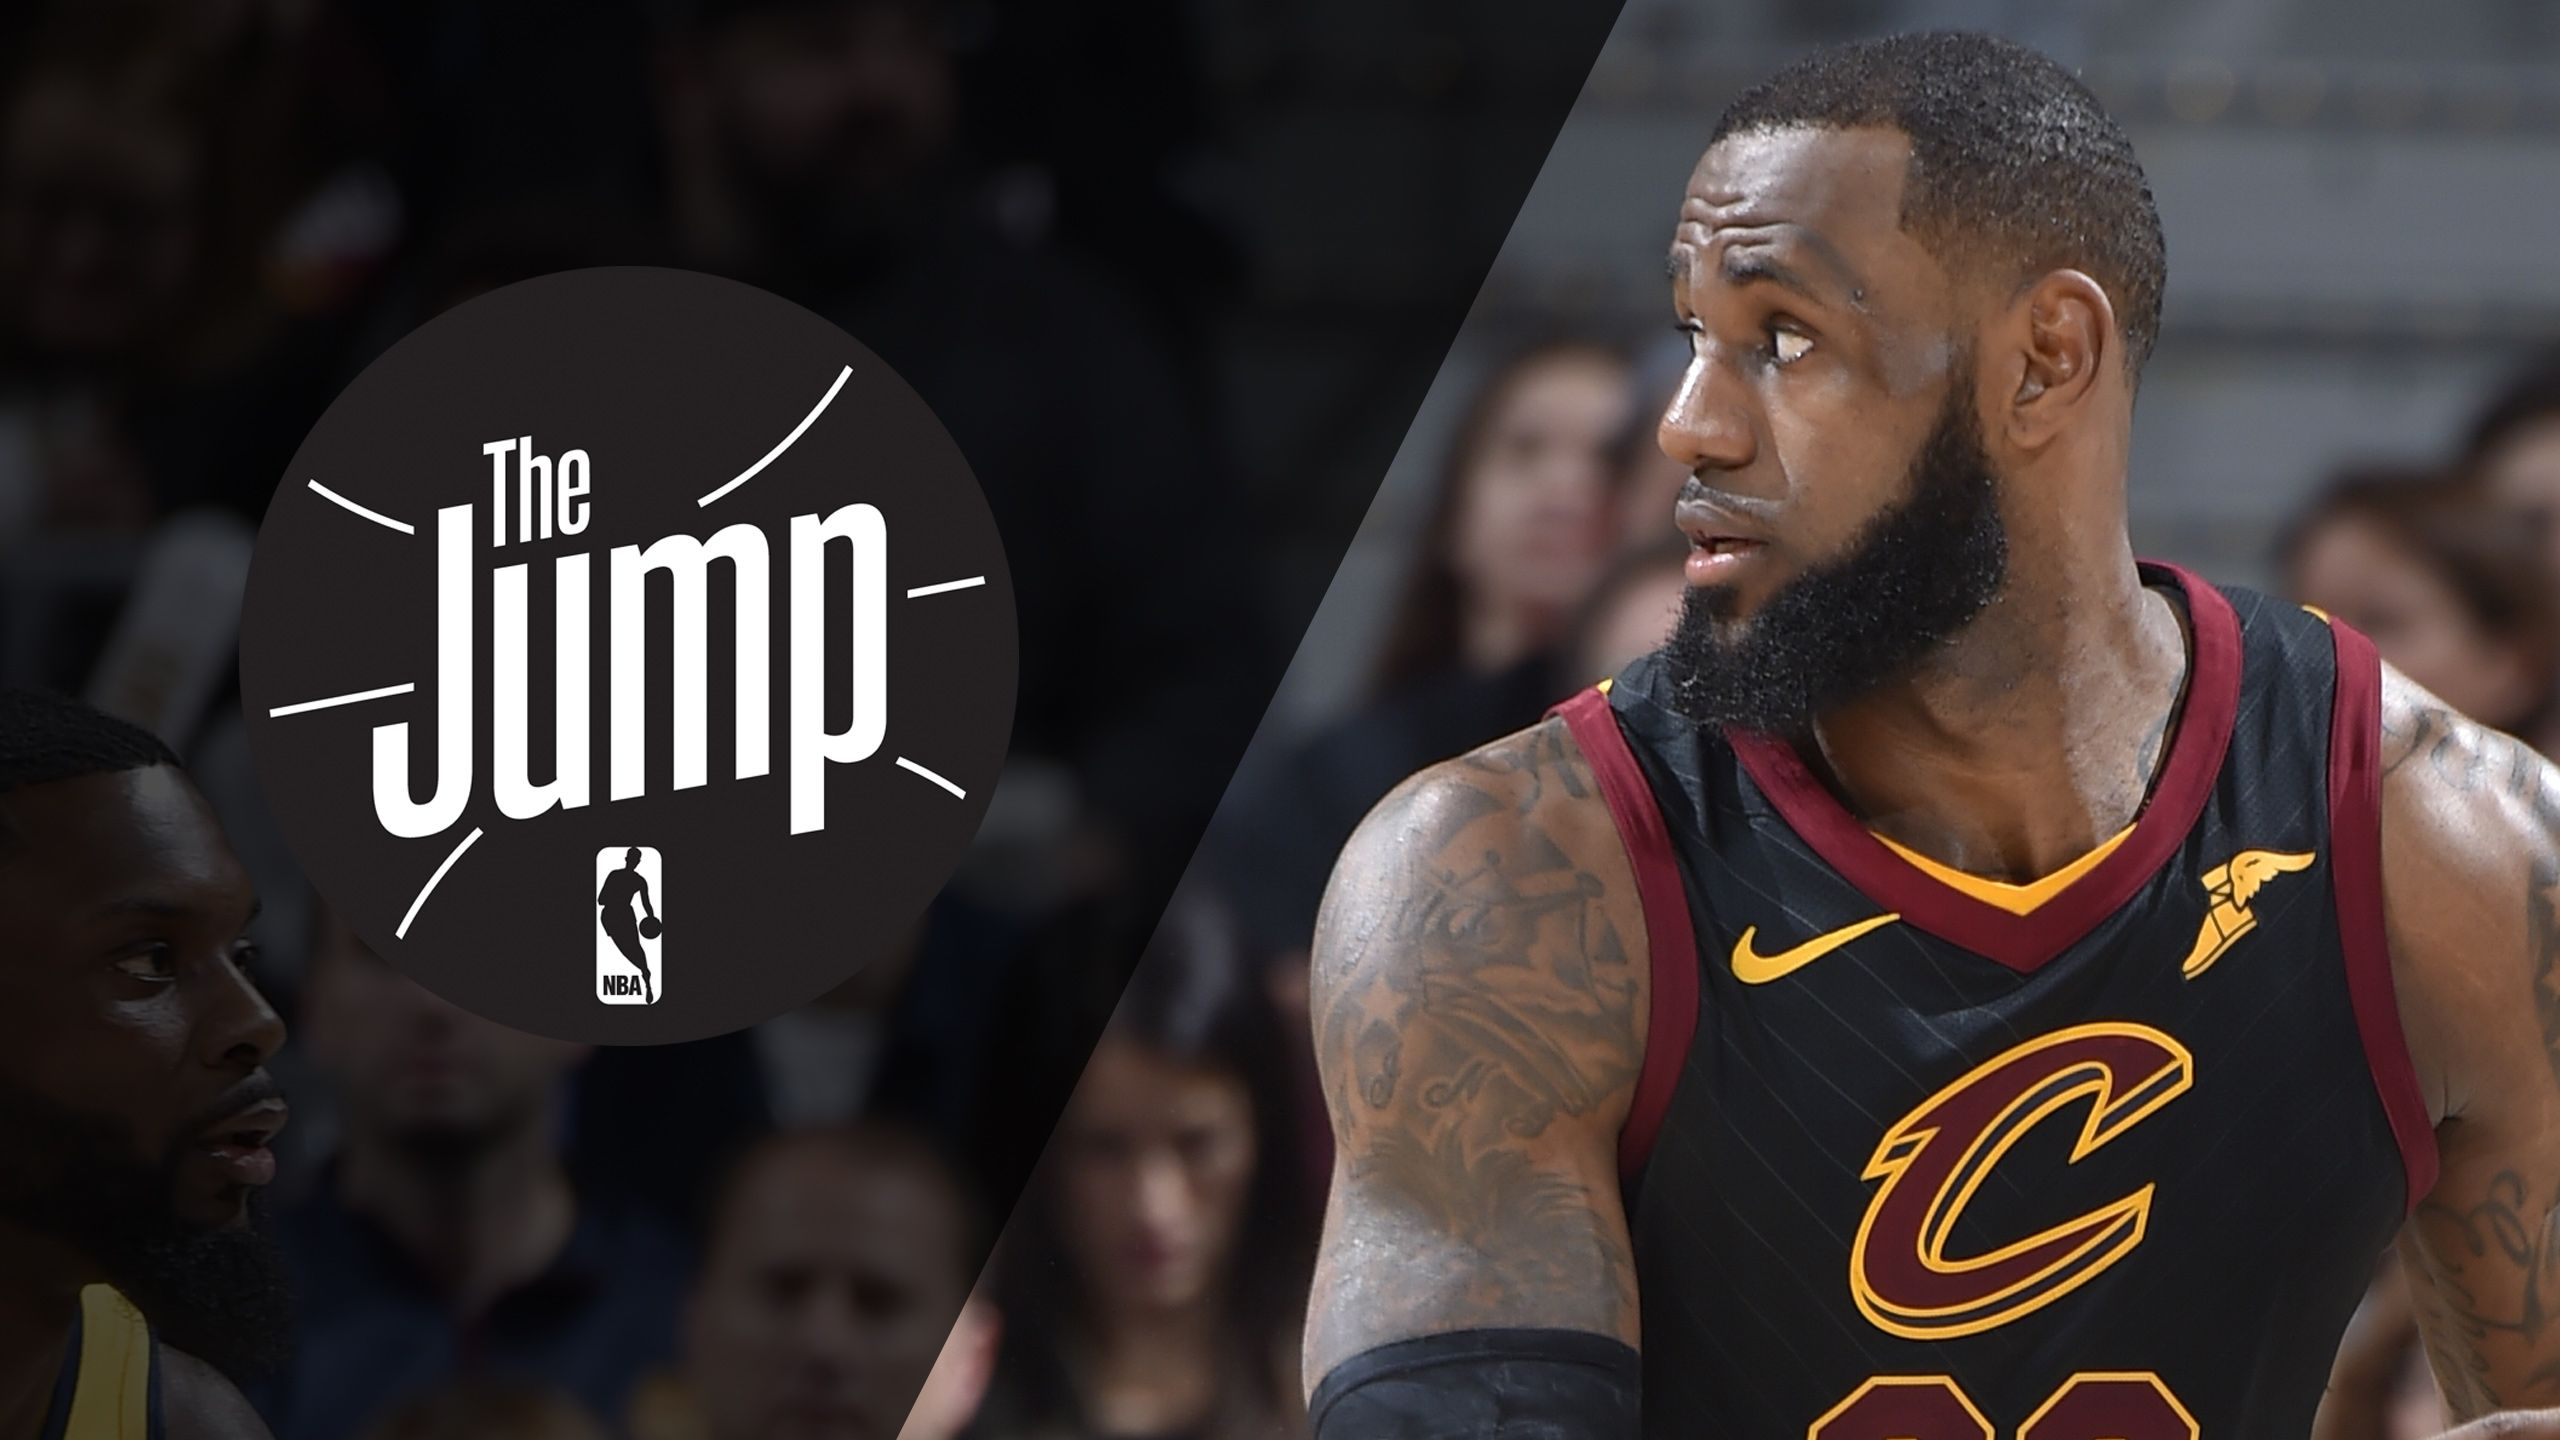 Mon, 4/16 - NBA: The Jump